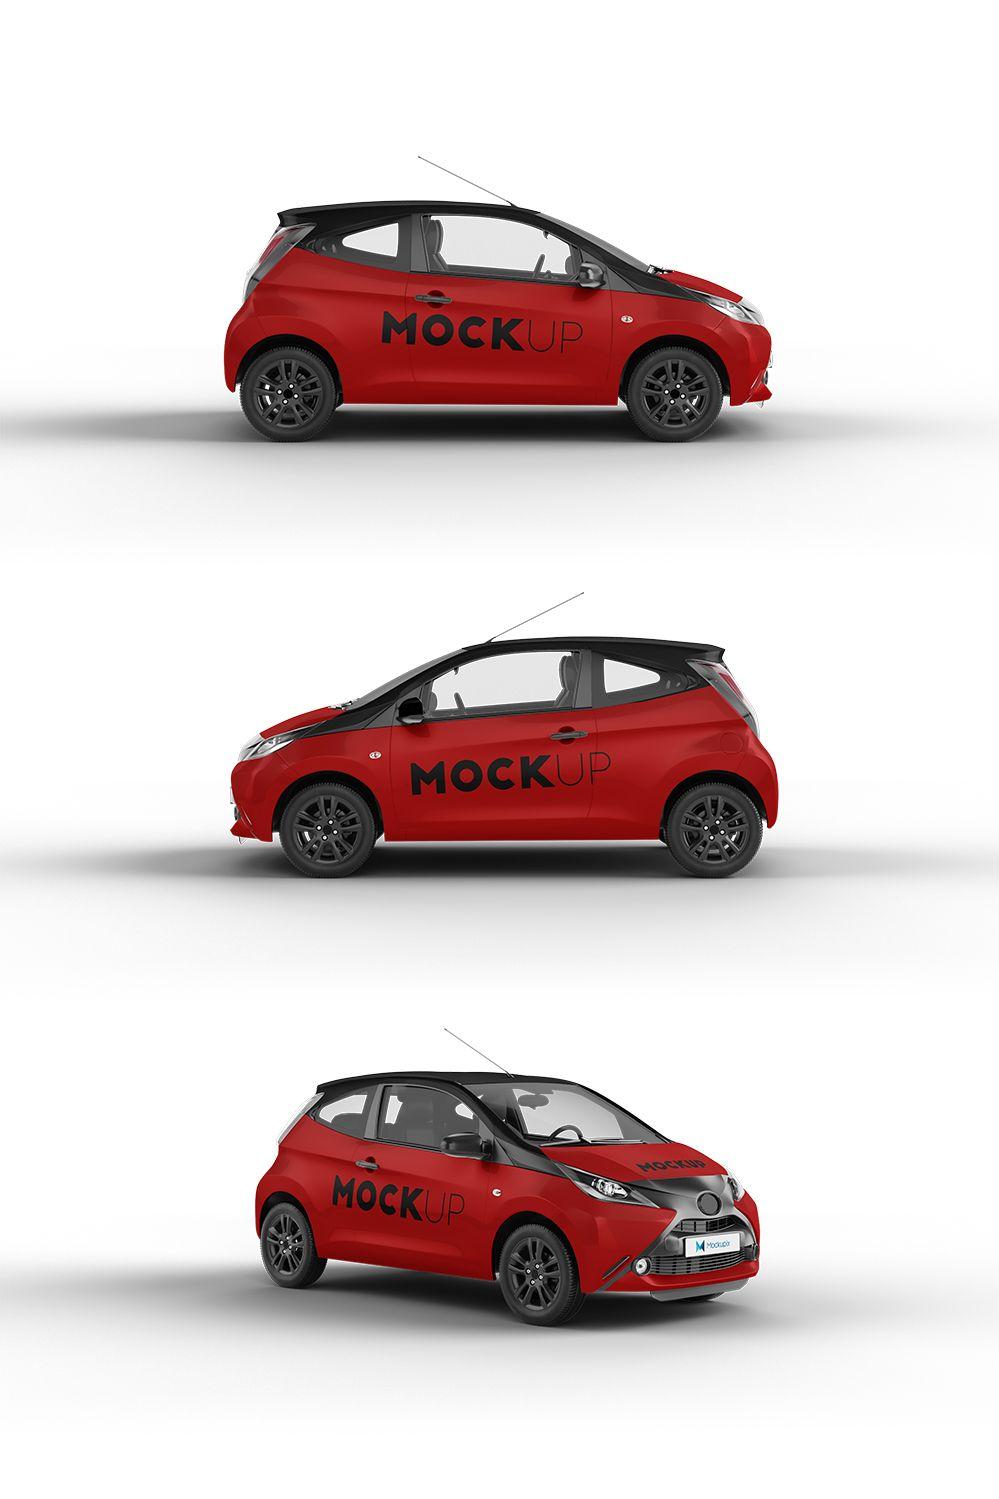 Realistic Toyota Aygo Car Mockup 6 Psd Files Vehicle Toyota Creativemarket Graphicdesign Carwraps Car Painting Branding Corpor Mockup Car Toyota Aygo